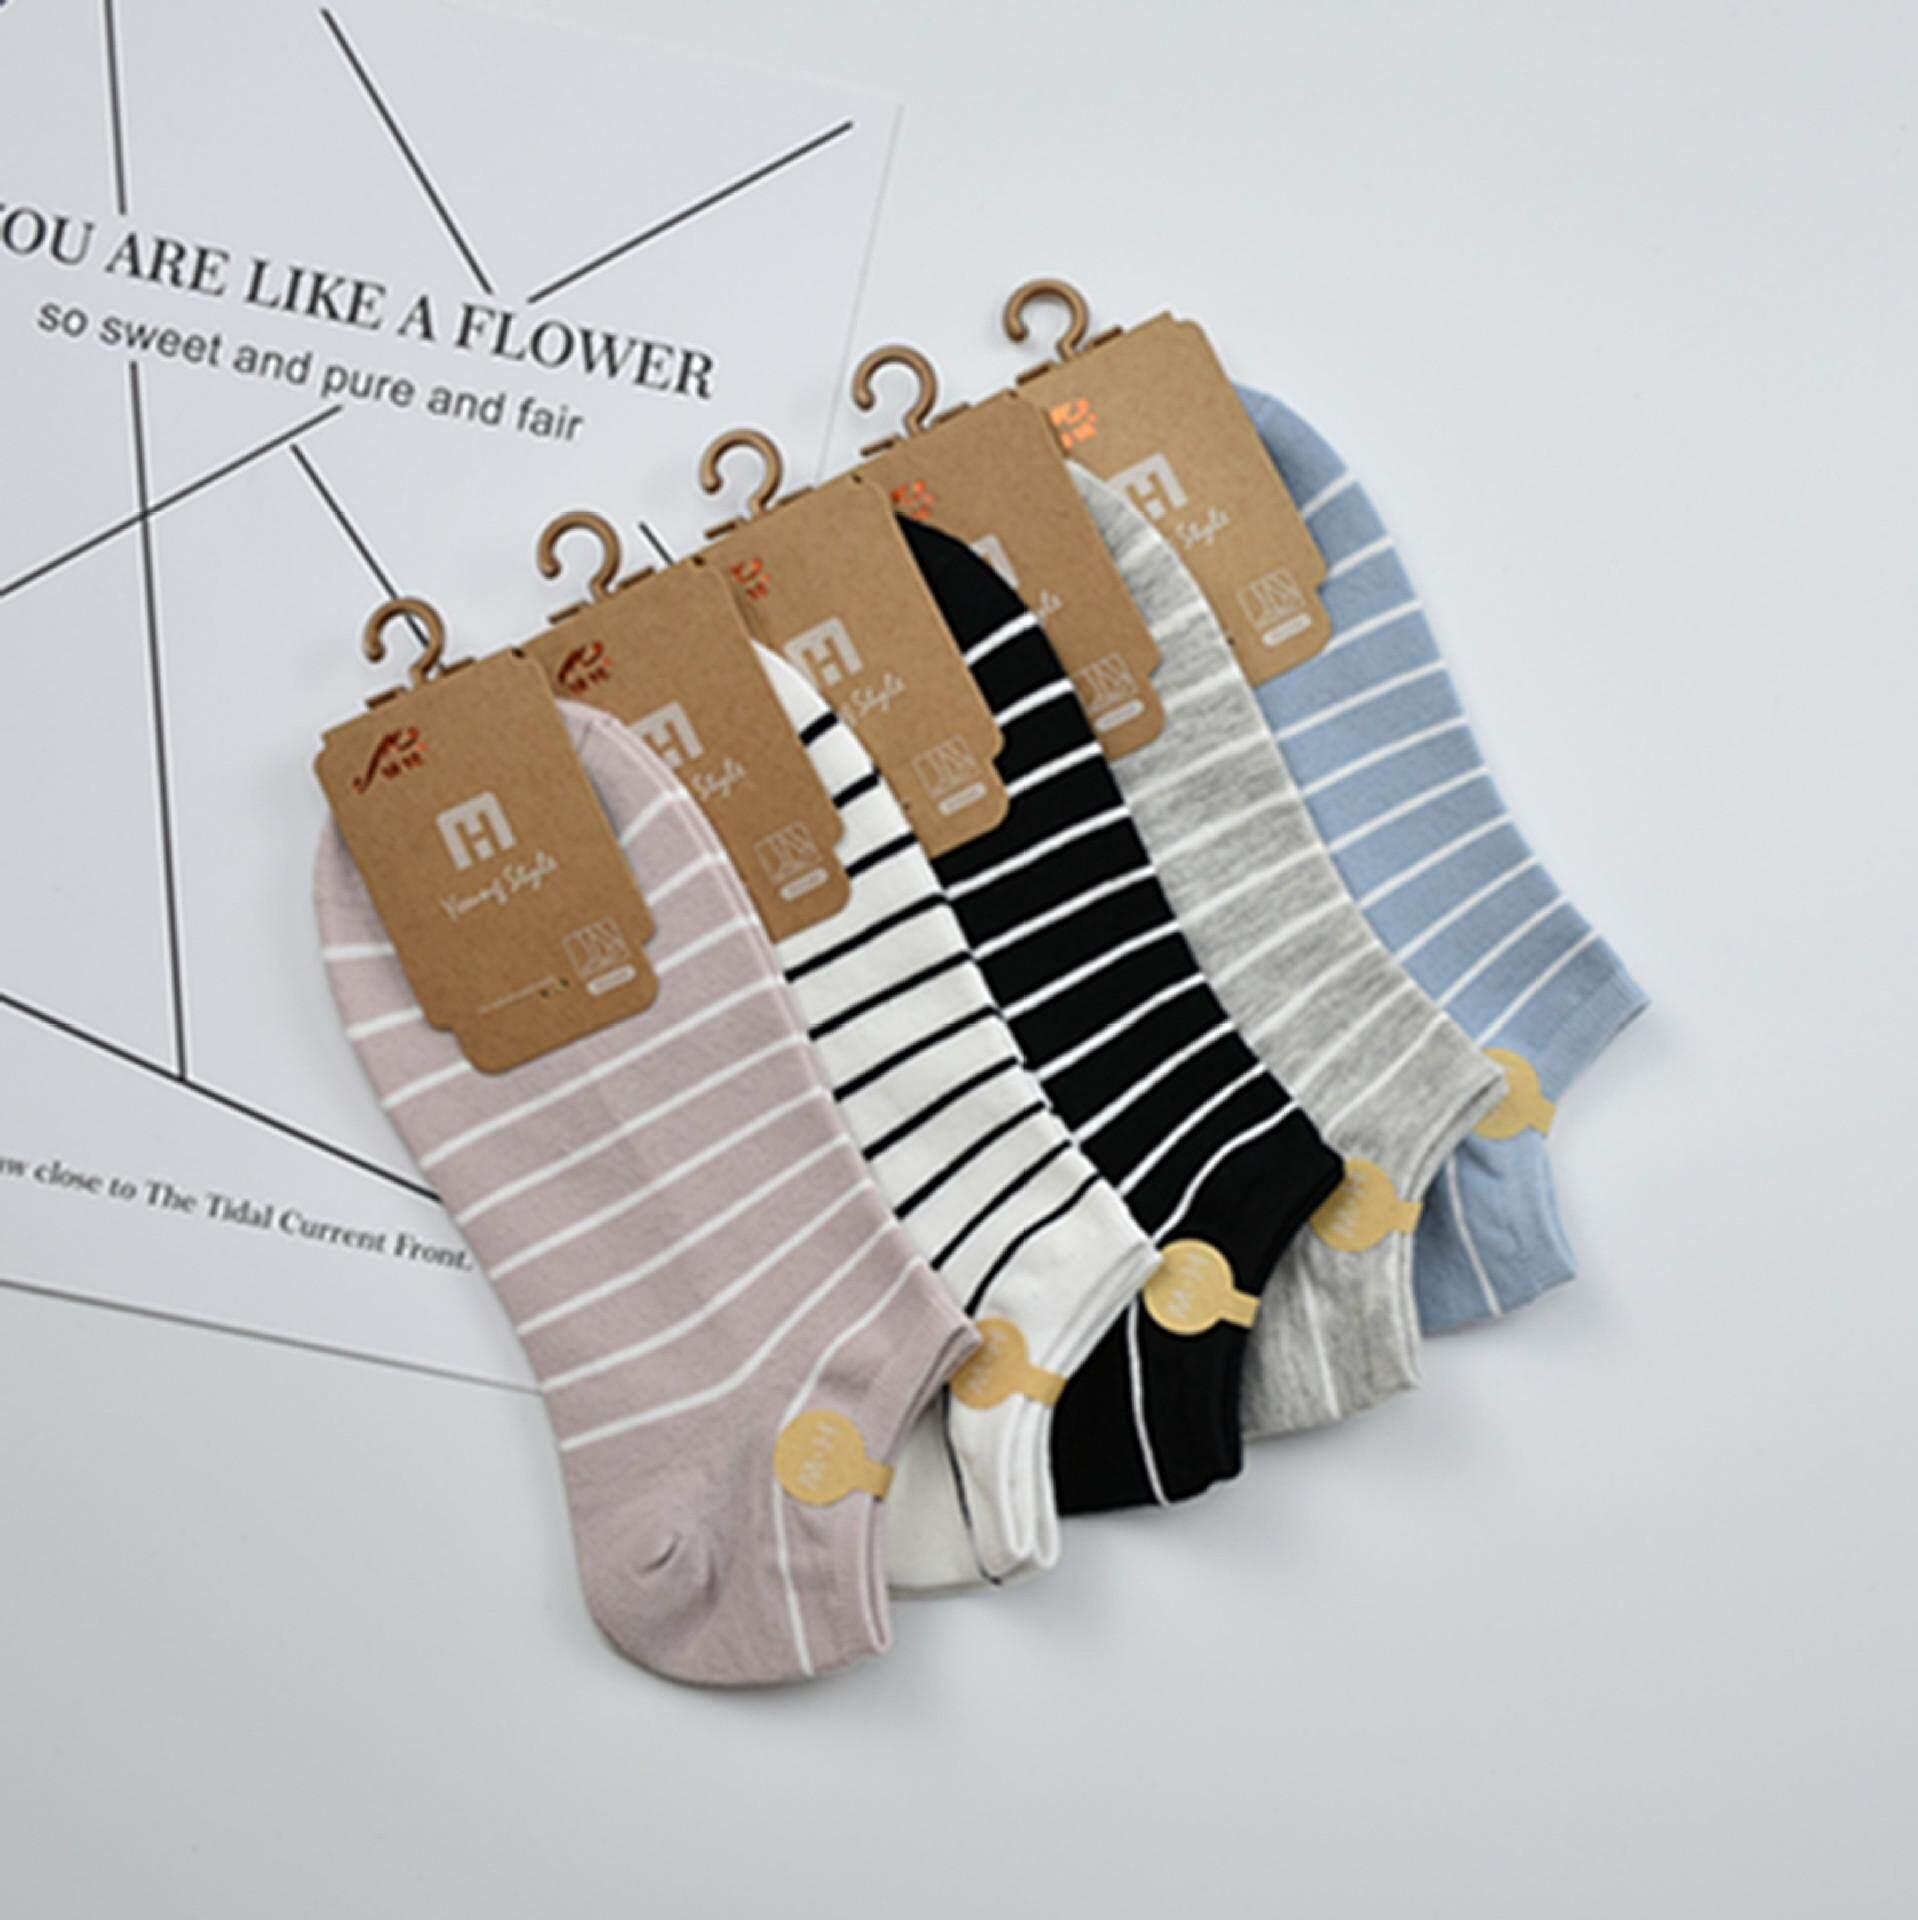 858a56deb51 Comfort Life (5 Pairs) Stripe Pure Cotton Socks Women Girls Lady Summer  Socks